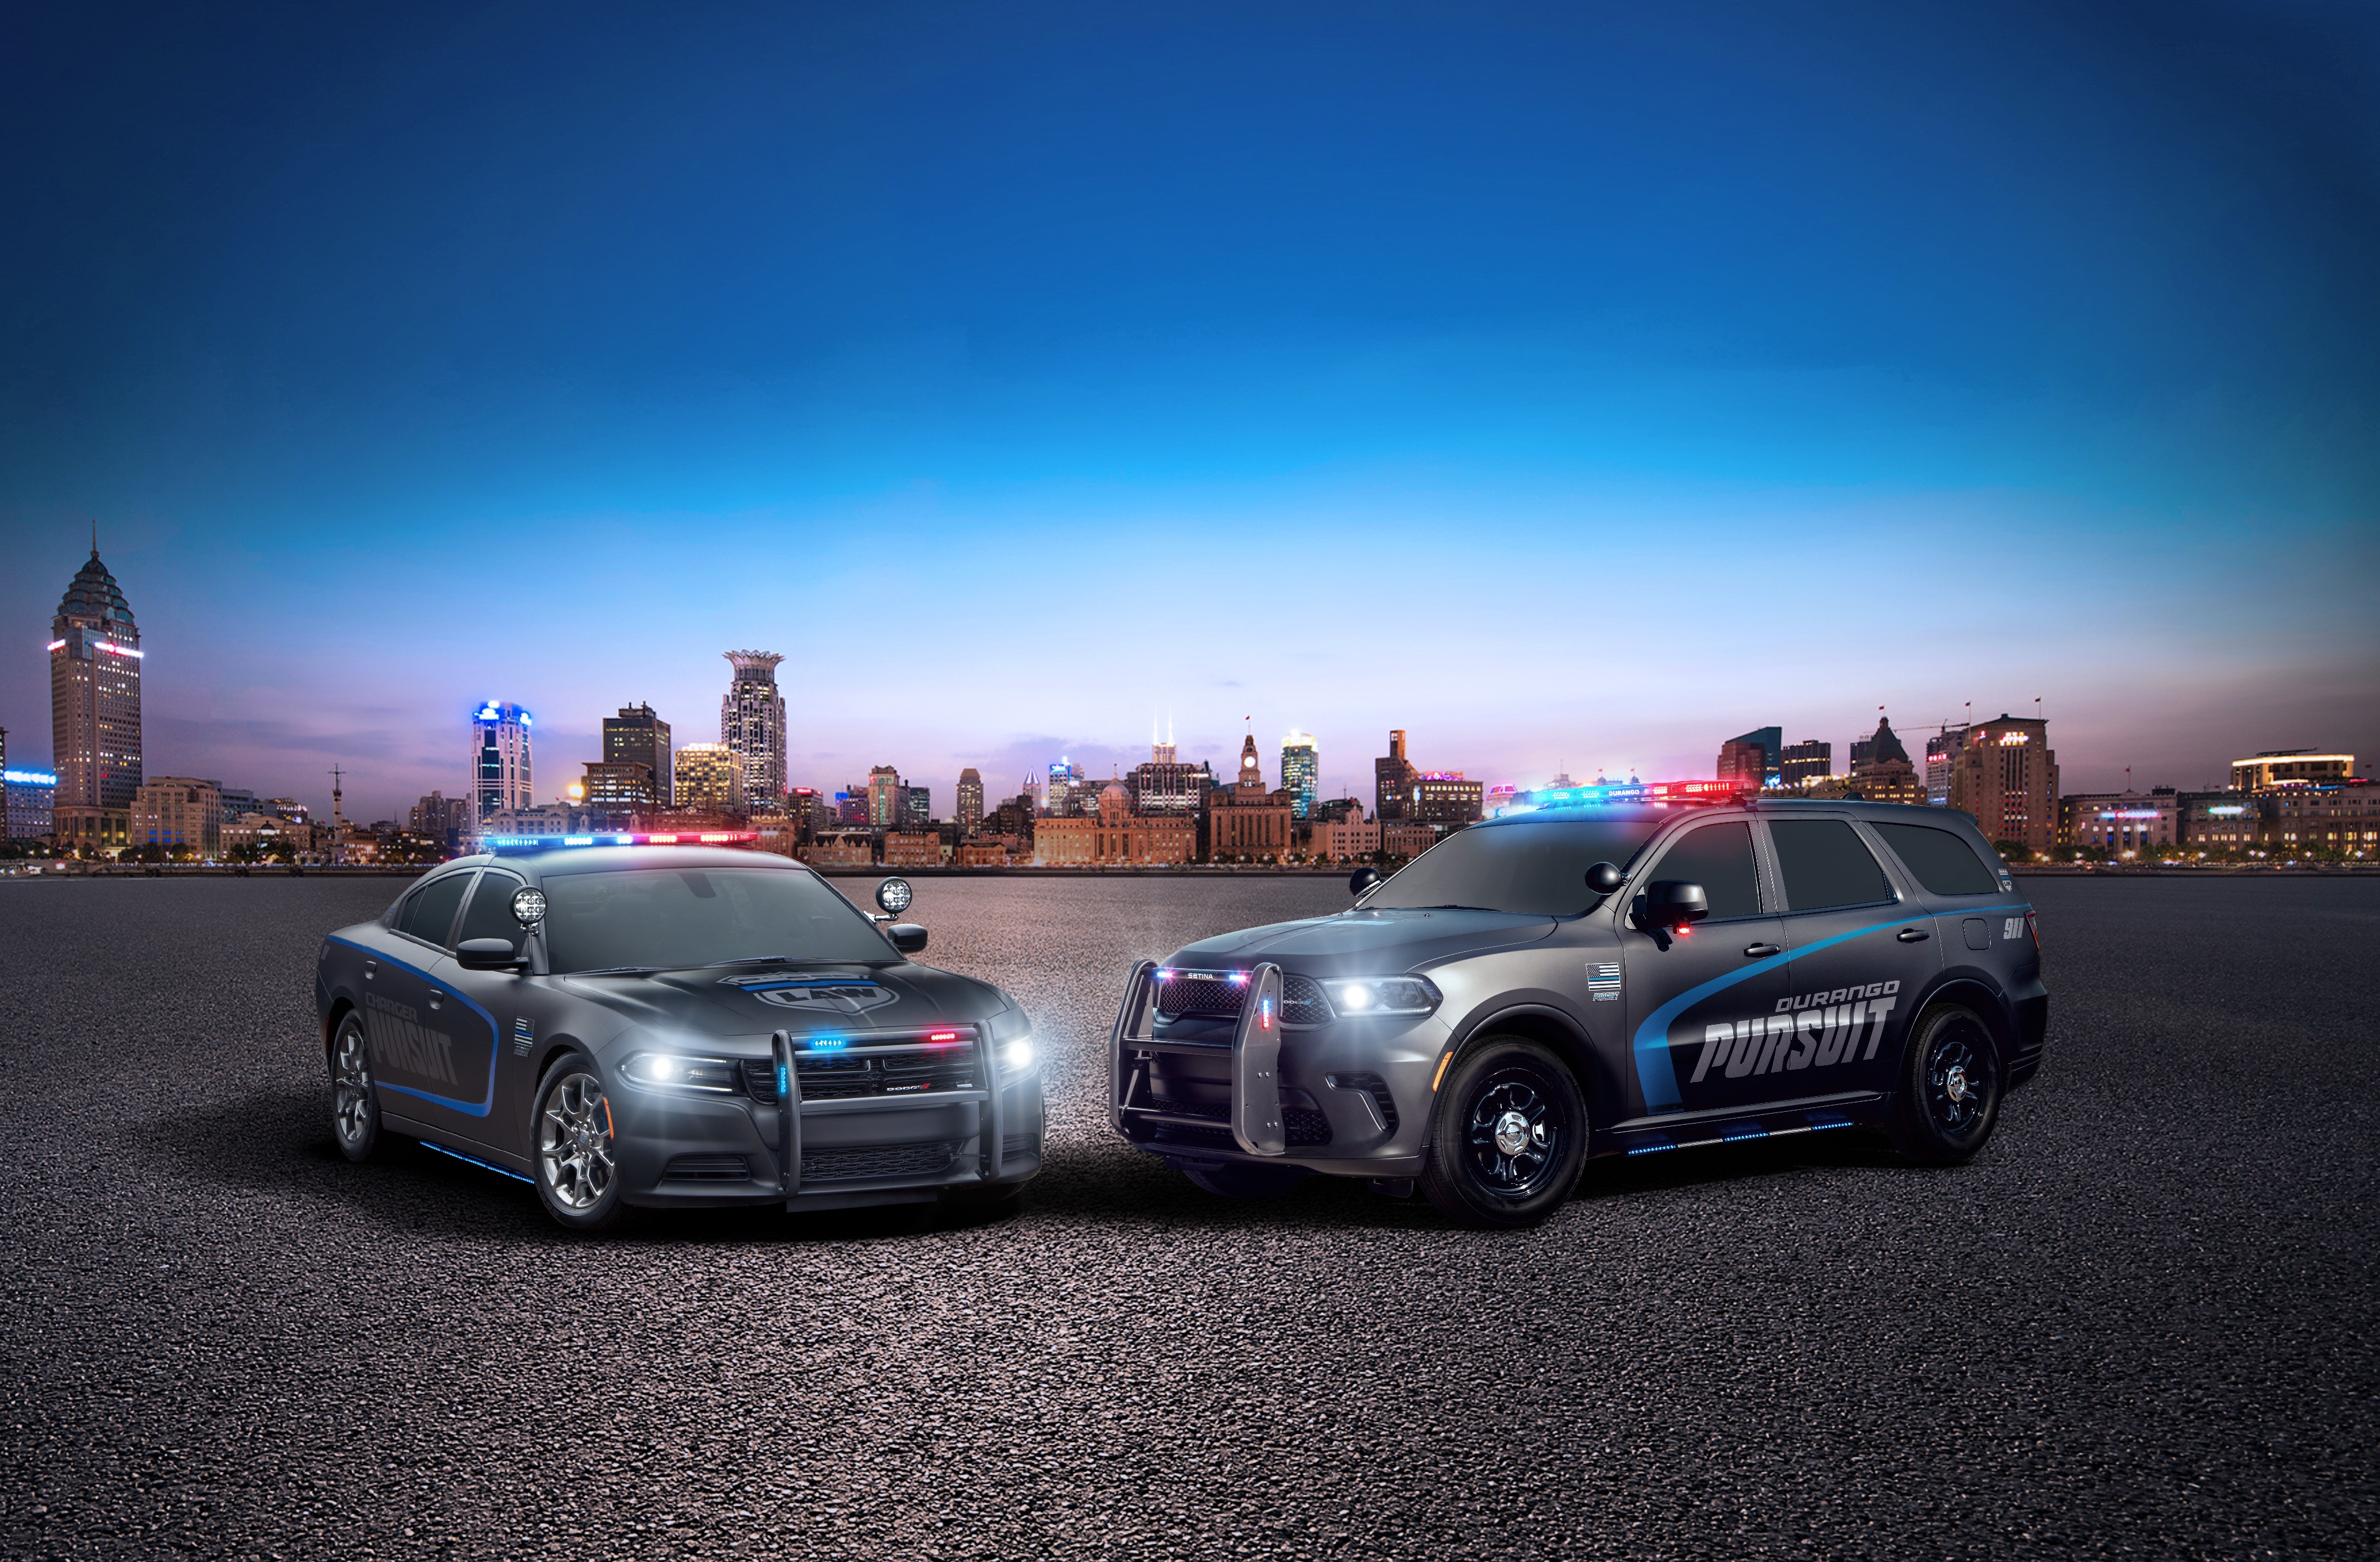 Dodge Charger Pursuit Dodge Durango Pursuit Updates For Model Year 2021fca Work Vehicles Blog